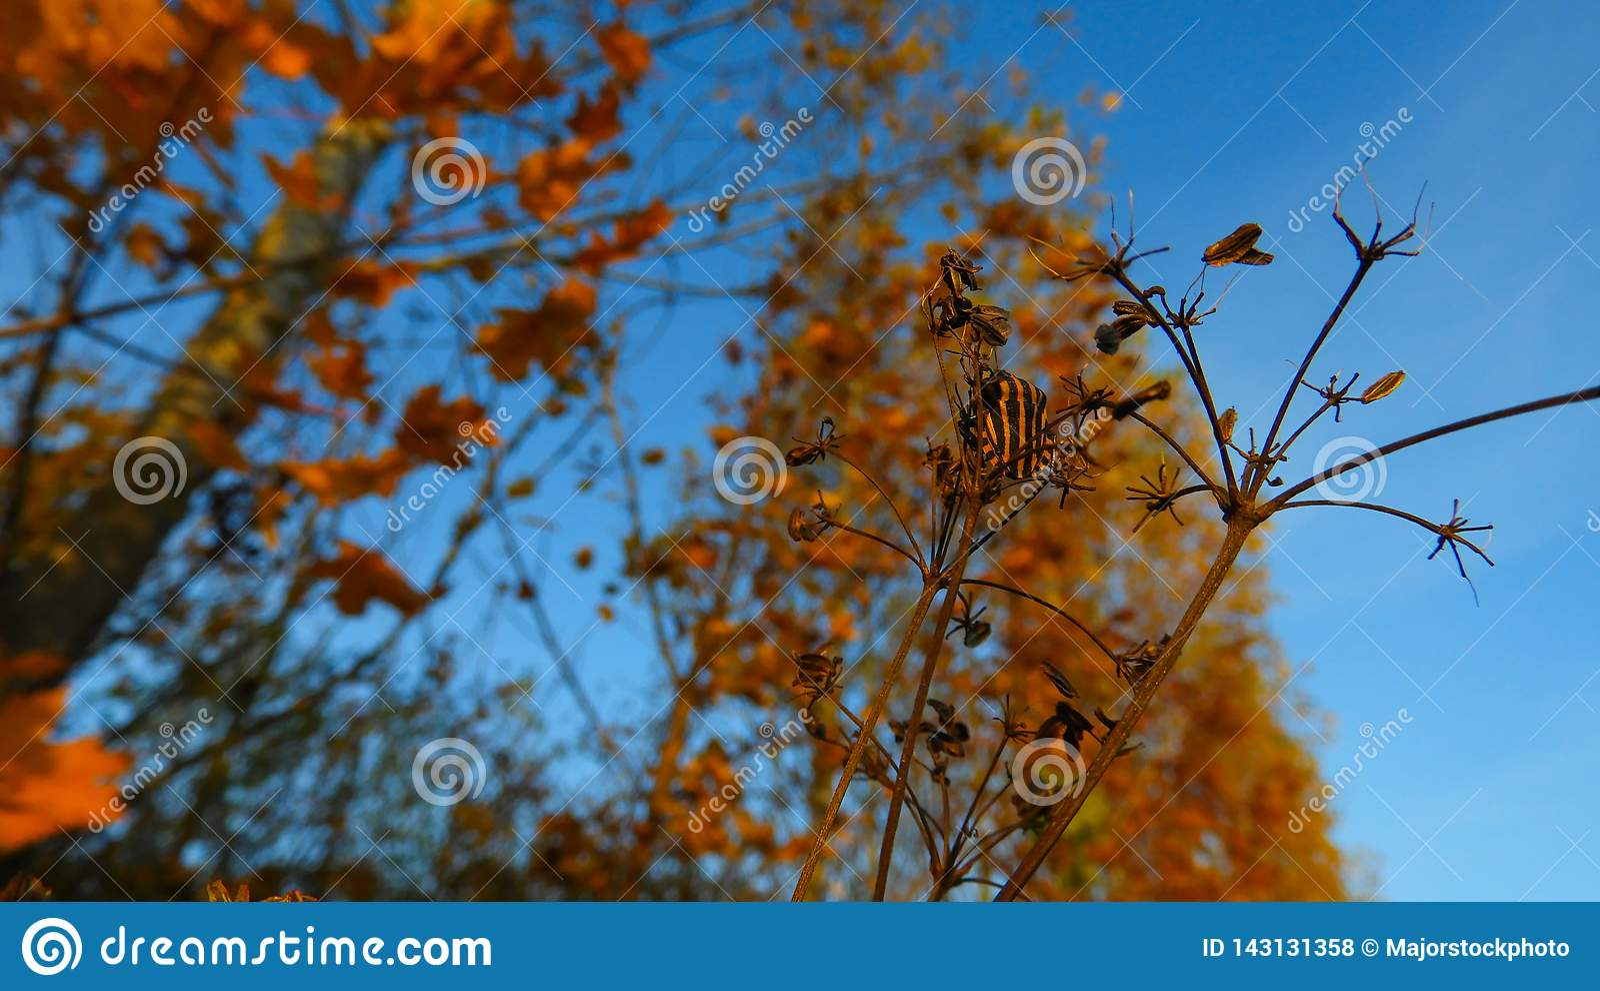 Orange svart randig skalbagge i höst på Donaukusten